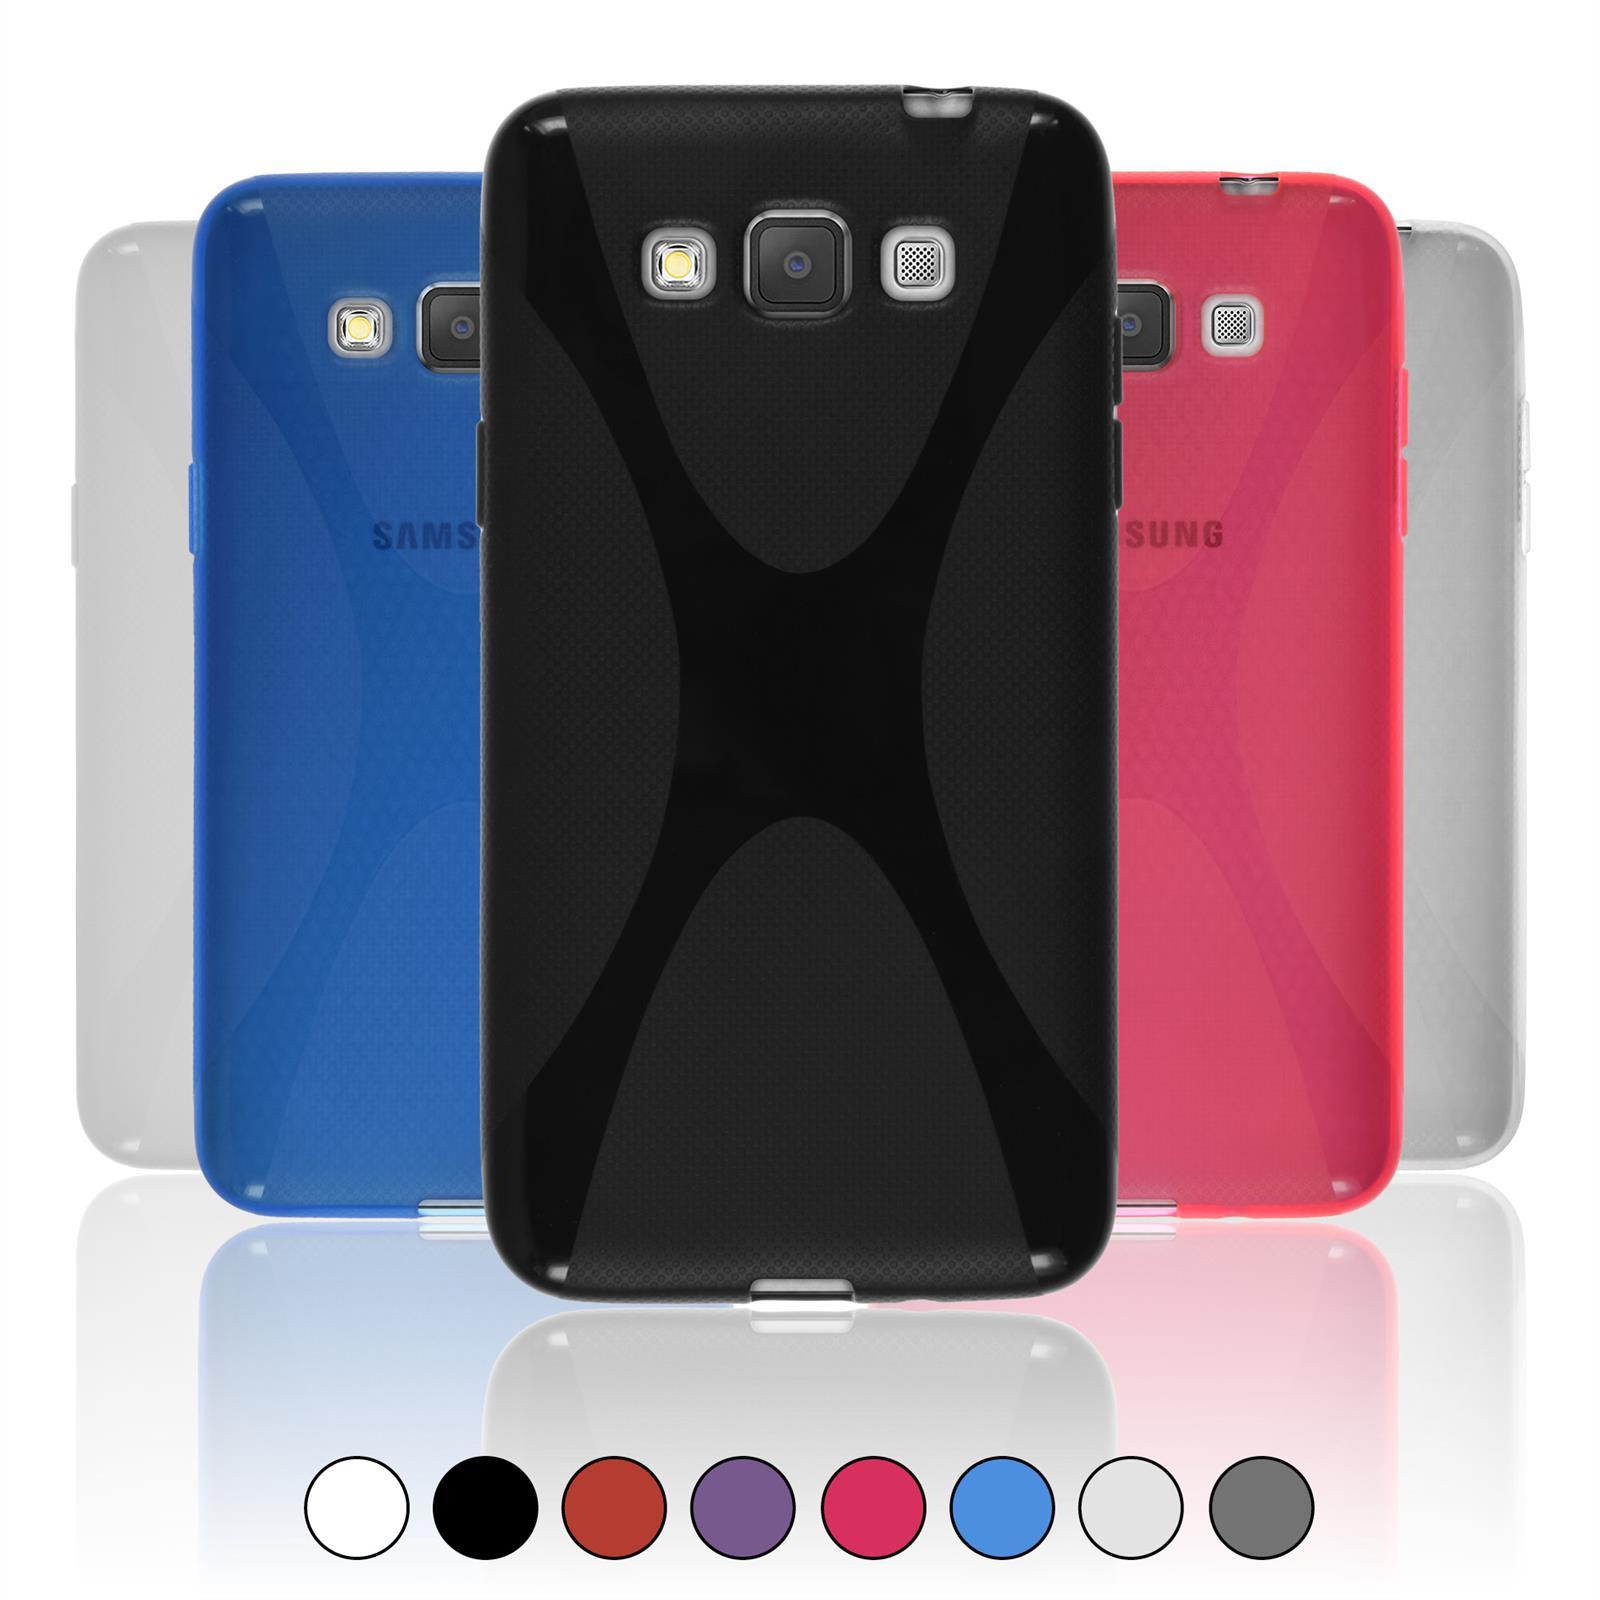 Coque-En-Silicone-Pour-Samsung-Galaxy-X-Style-Cover-Case-2-Films-De-Protection